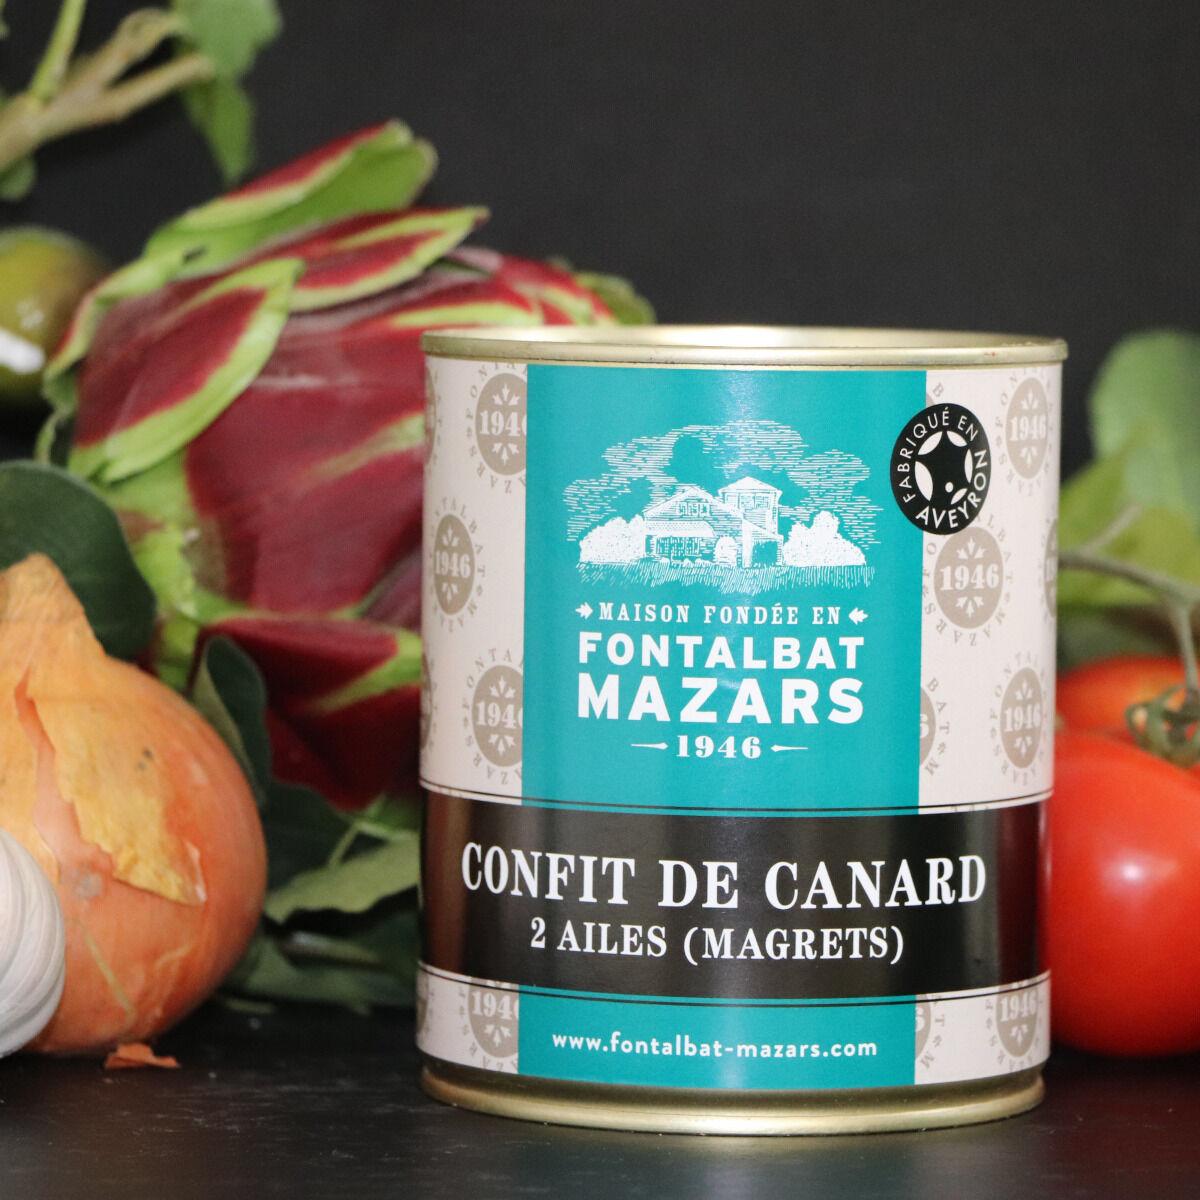 Fontalbat Mazars Confit de canard boite 2 ailes